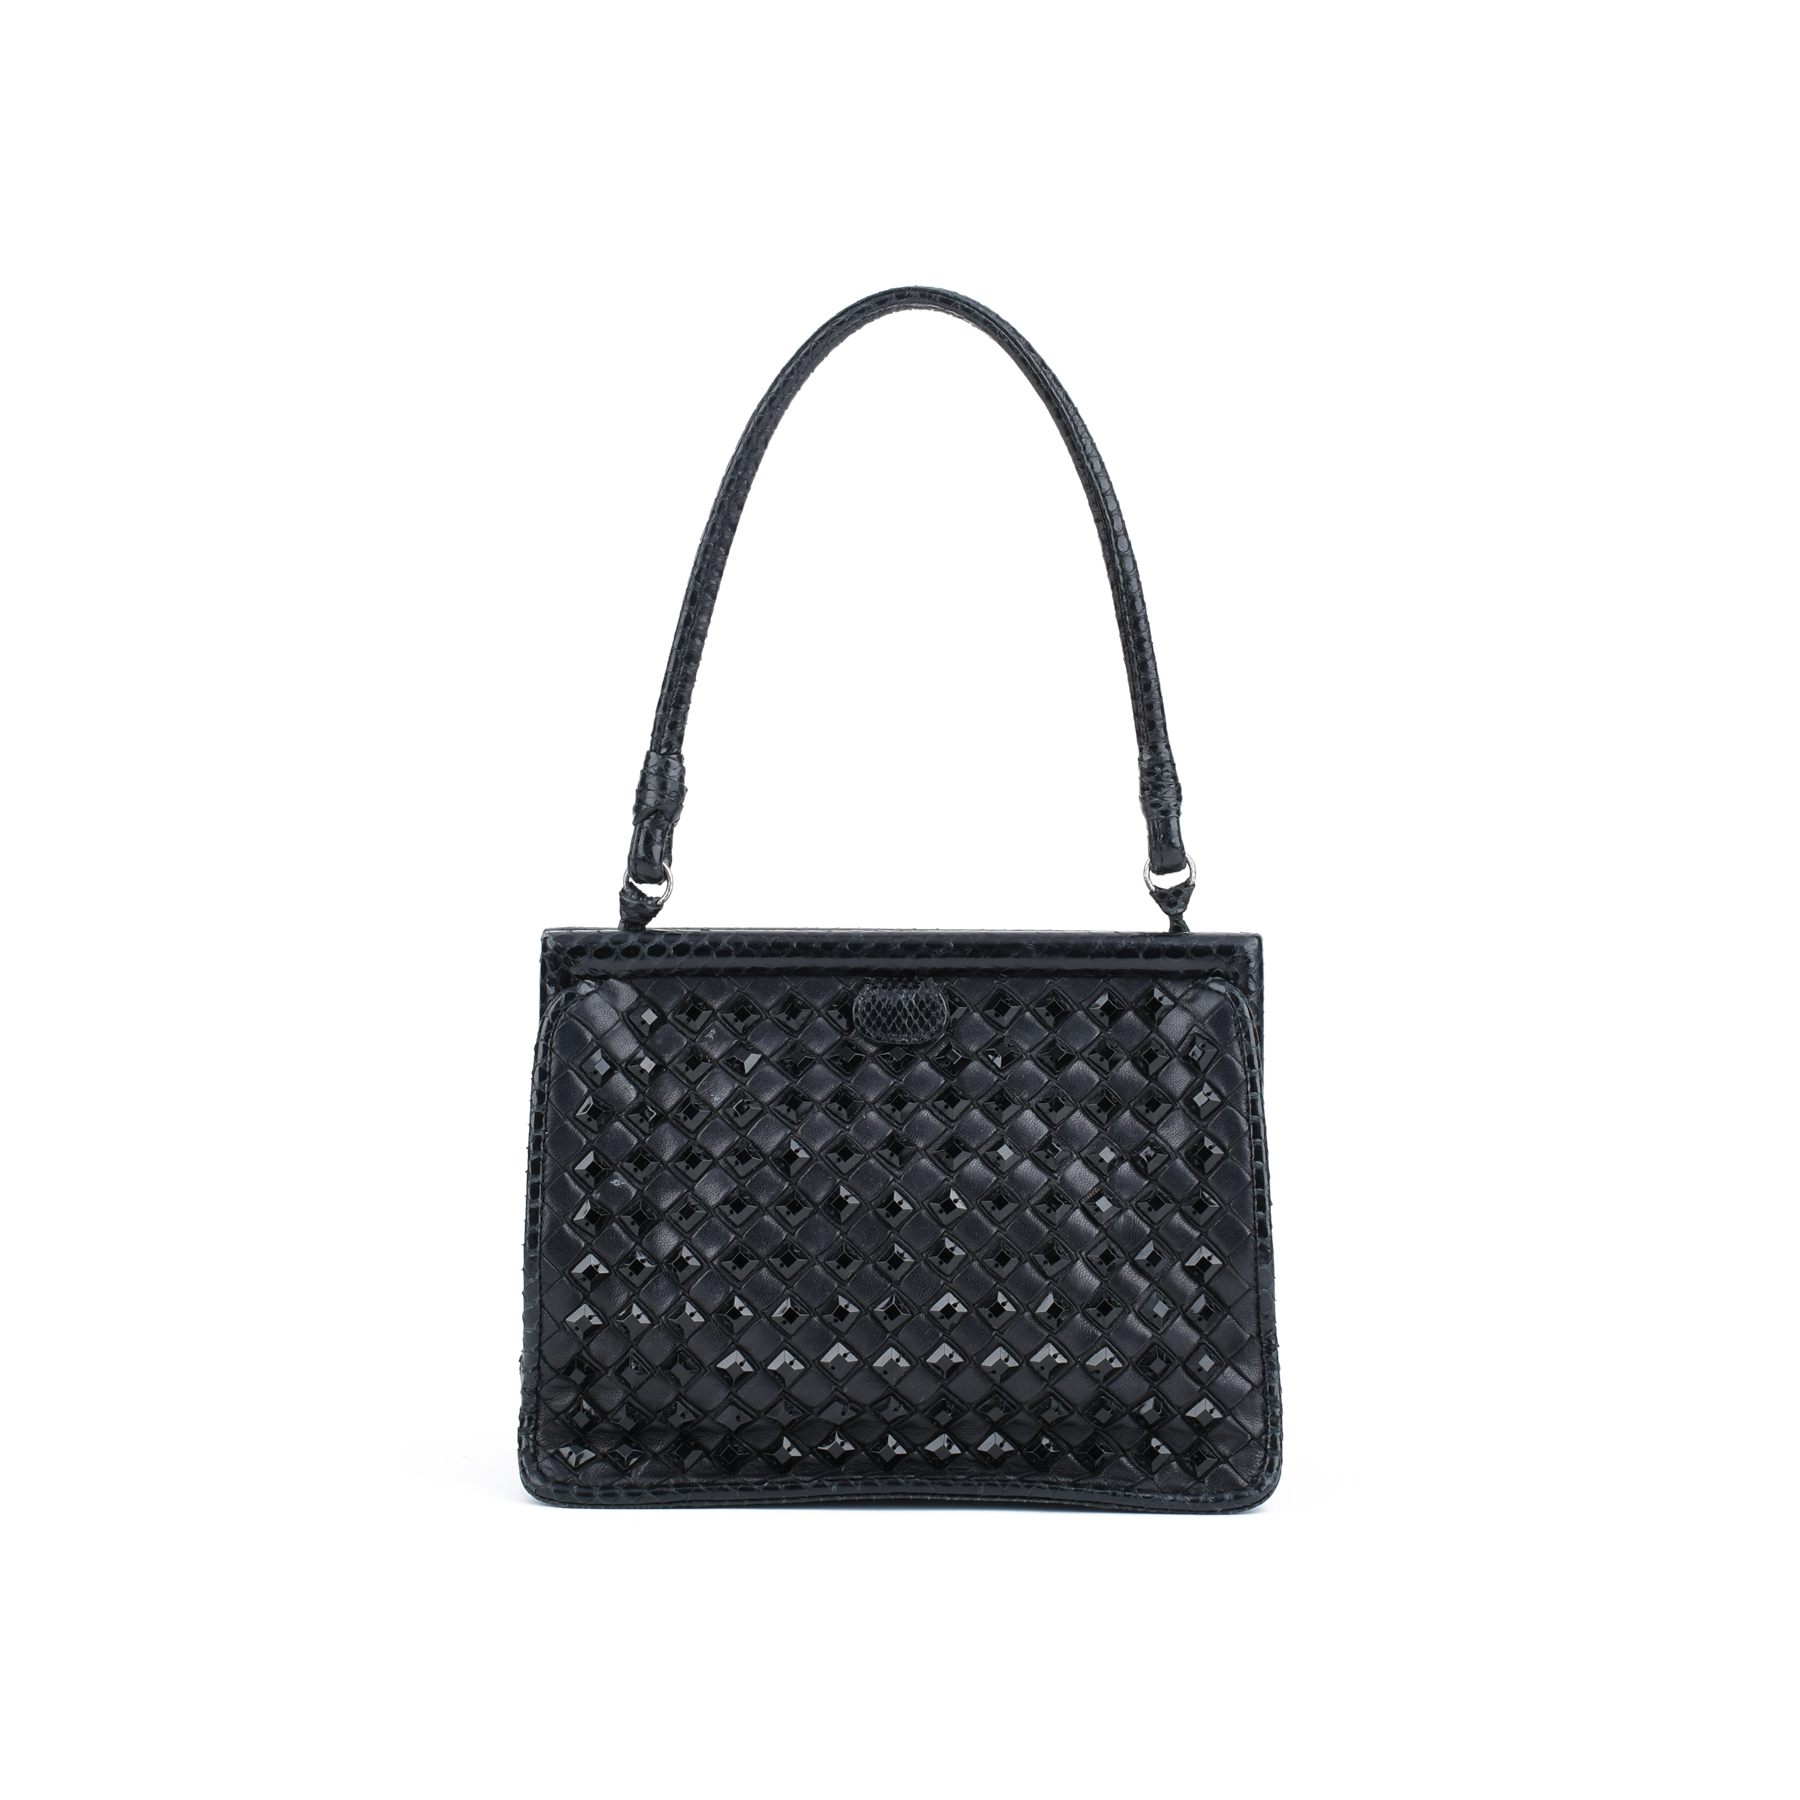 e3d9c9527d2 Authentic Pre Owned Bottega Veneta Intrecciato Evening Bag (PSS-420-00038)    THE FIFTH COLLECTION®